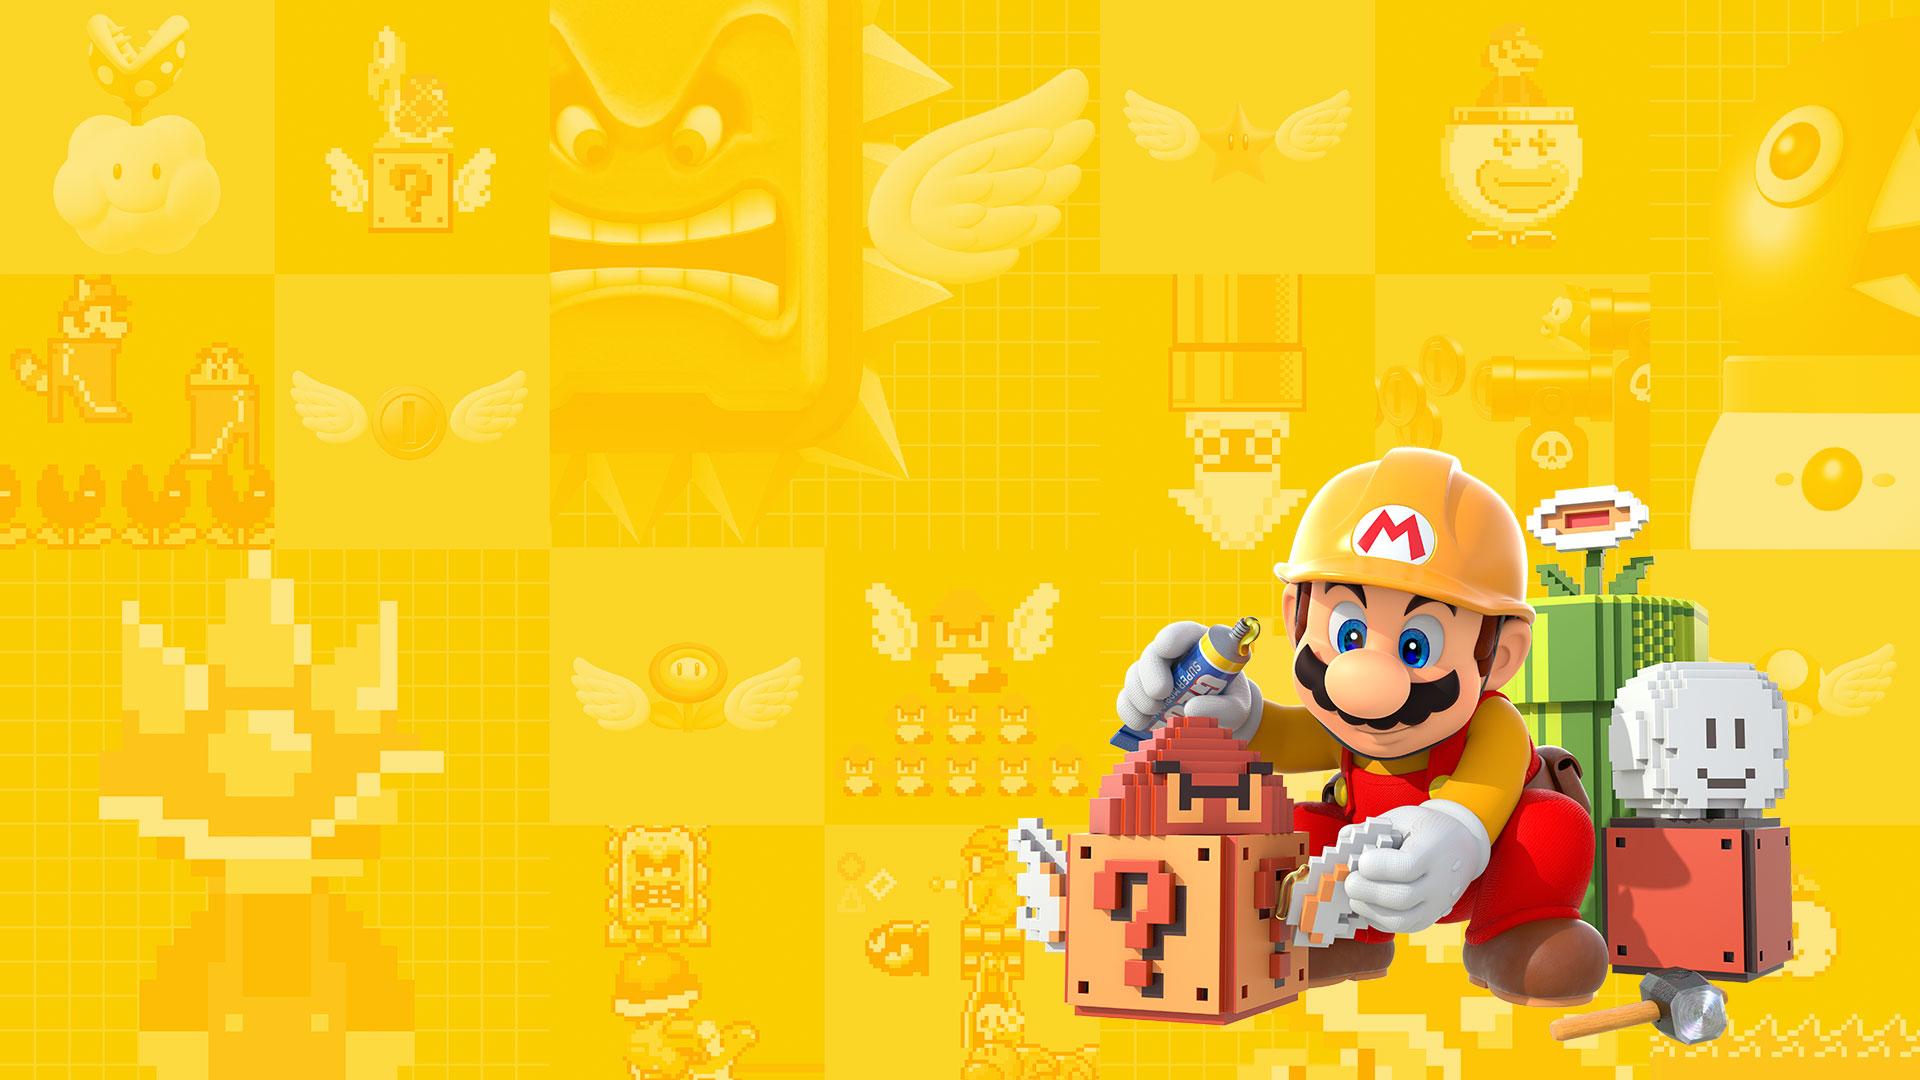 Squishy Super Mario Maker 1 : Super Mario Maker Is Offline - Gazette Review